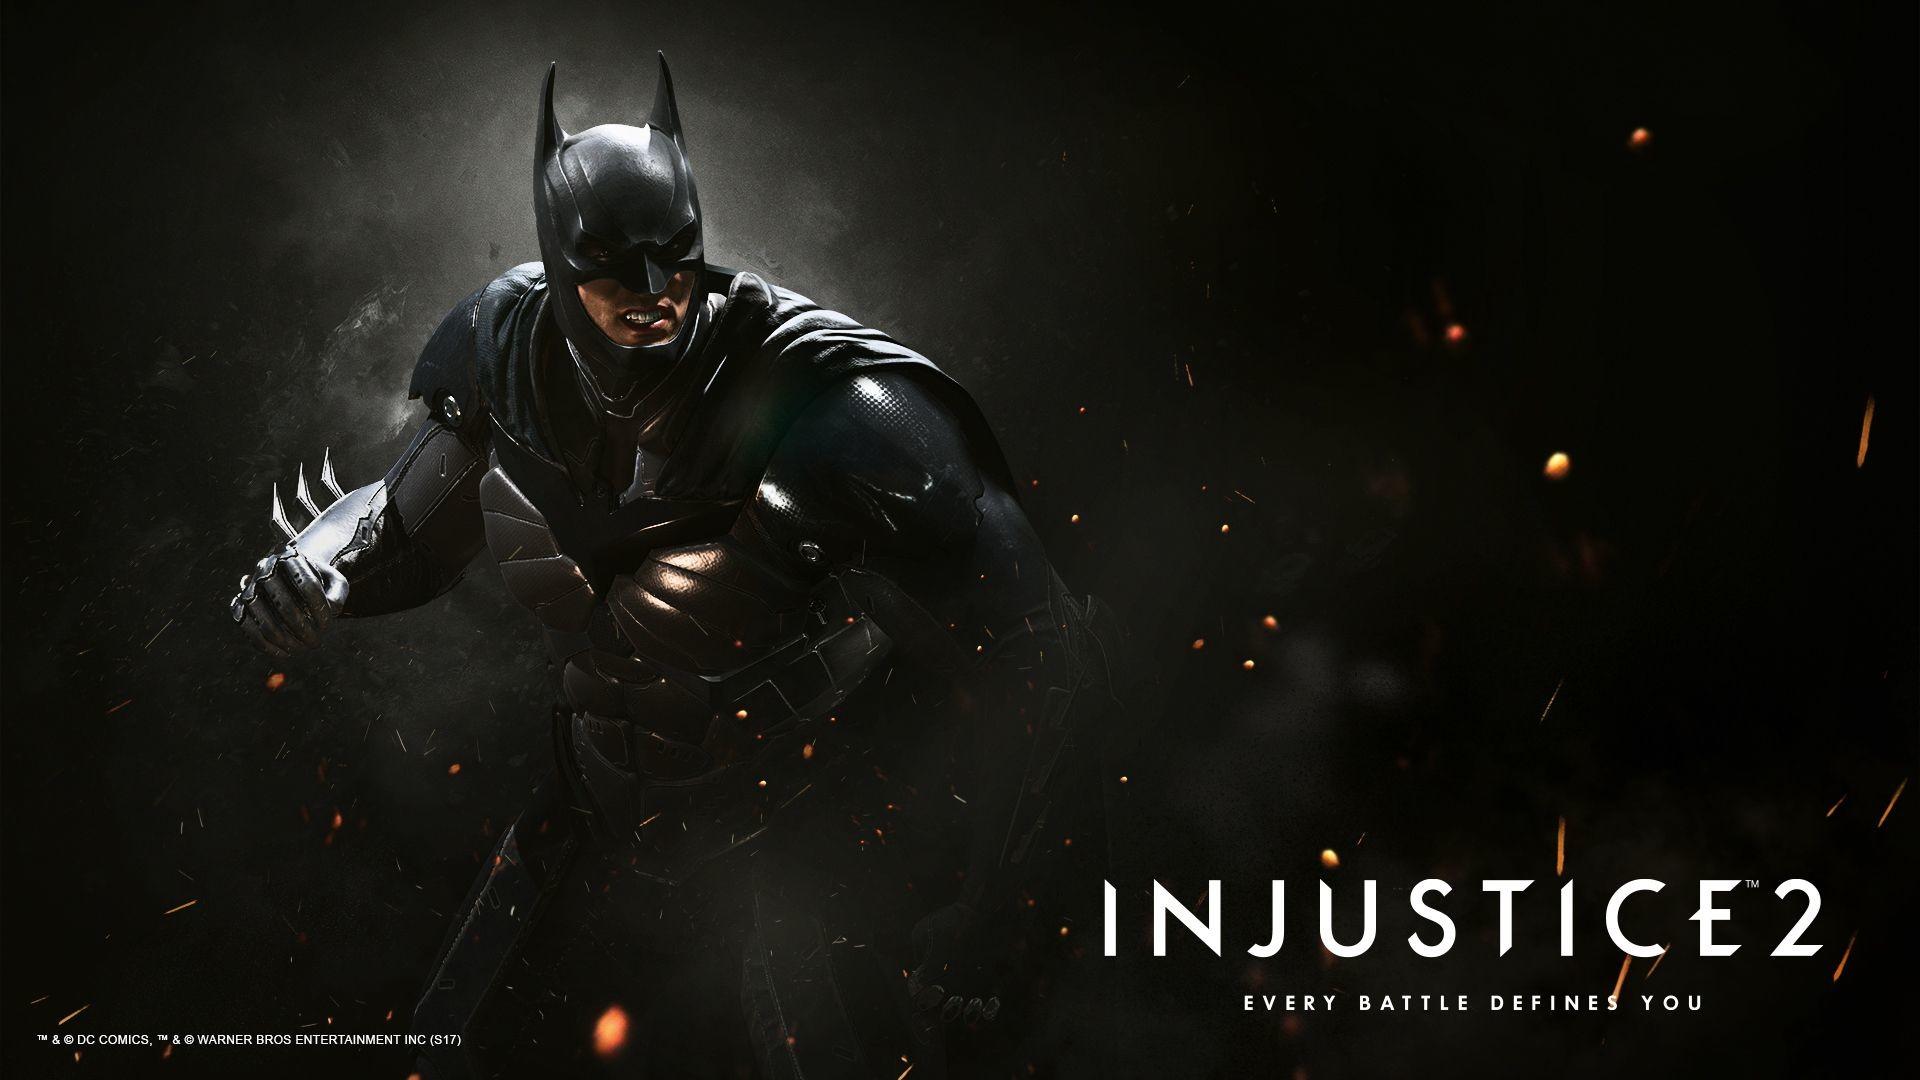 Injustice 2 Superman Hd Games 4k Wallpapers Images: Injustice 2 Wallpapers (81+ Images